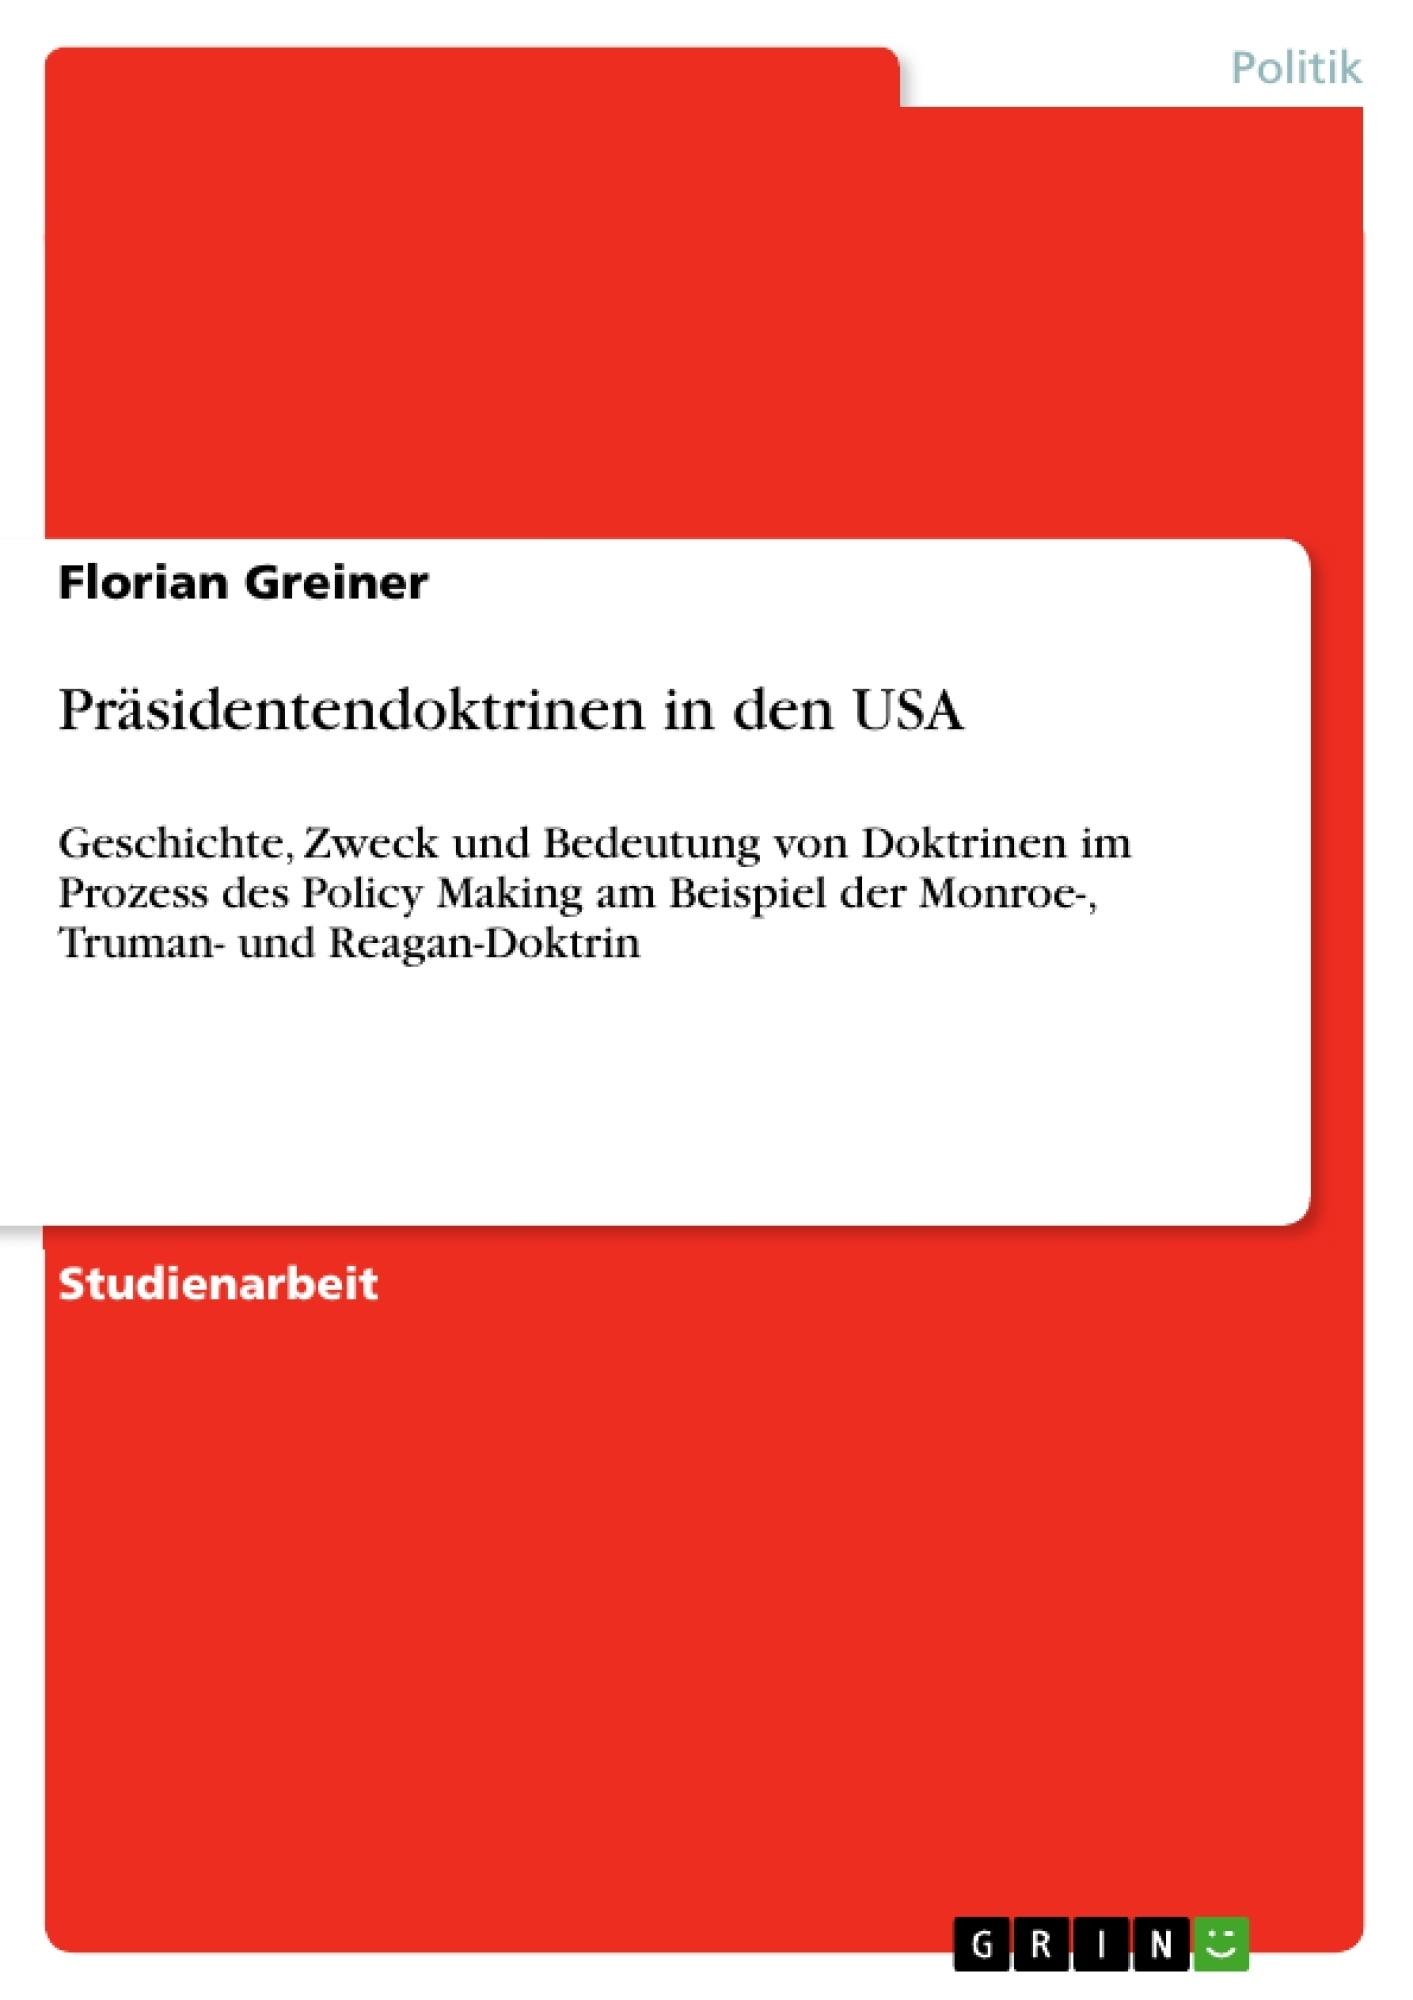 Titel: Präsidentendoktrinen in den USA